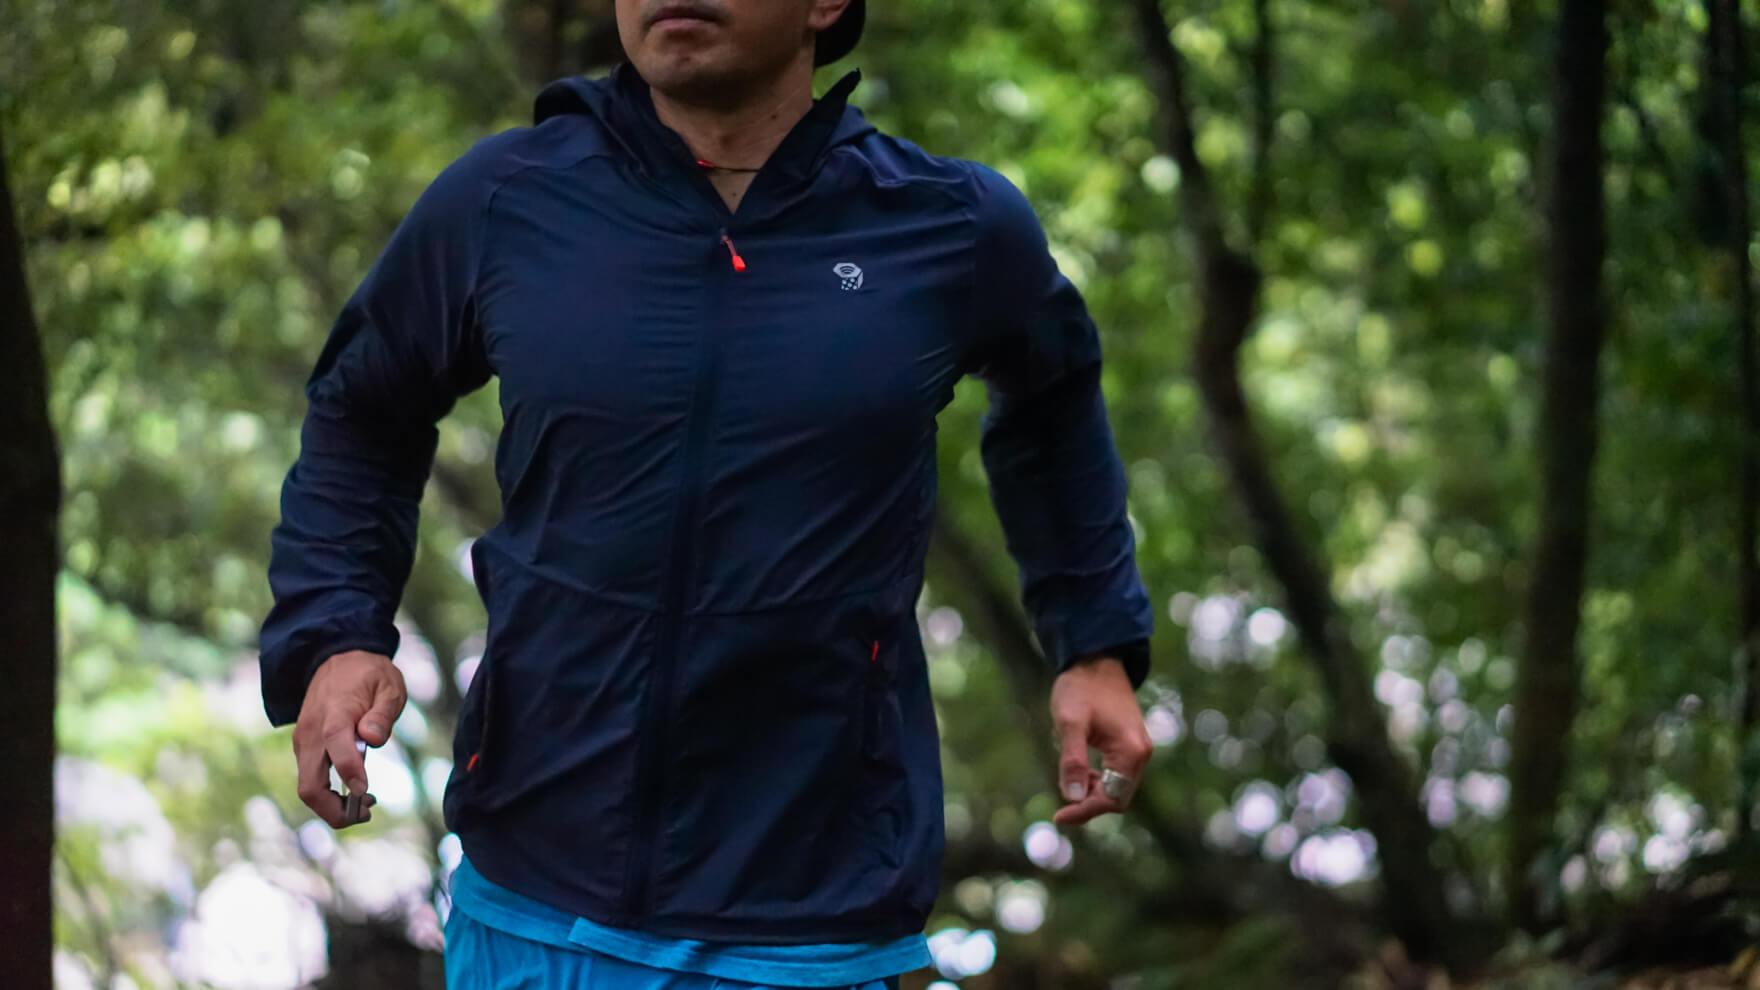 Review:ランナー・ハイカー必見!どこまでも快適な新しい行動着 Mountain Hardwear コアプレシェルフーディー